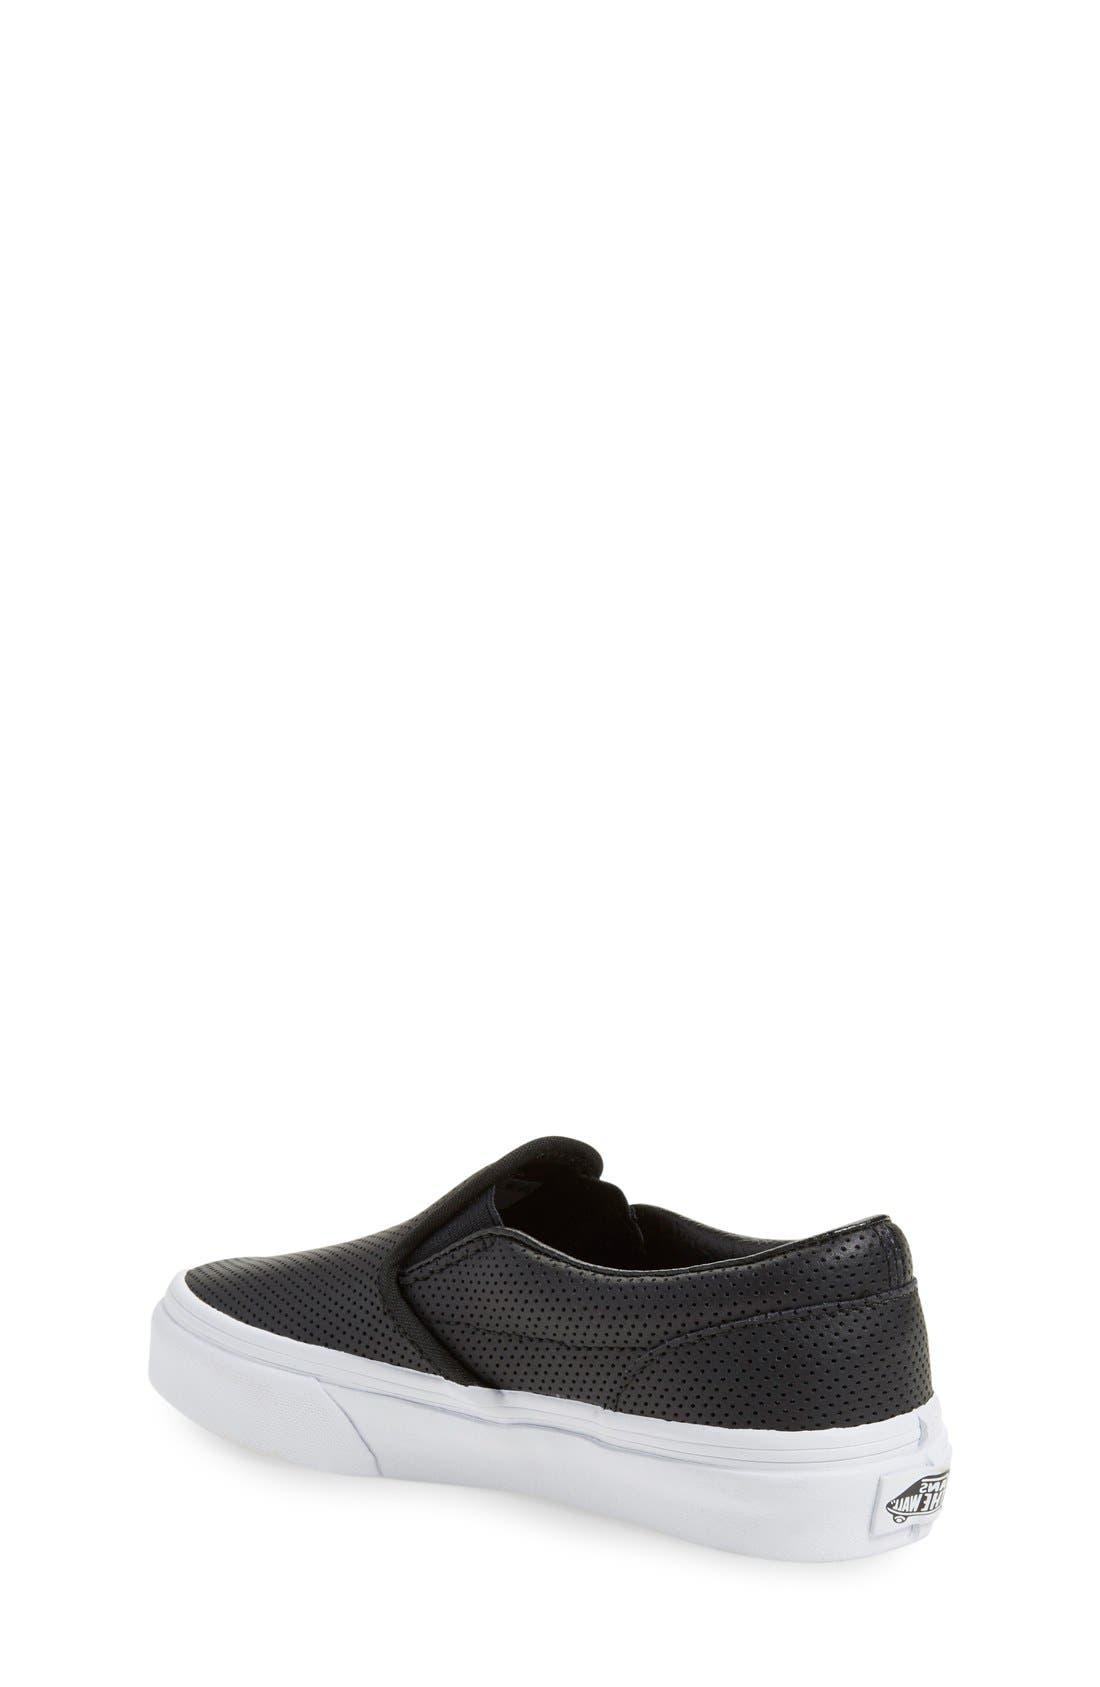 'Classic' Slip-On Sneaker,                             Alternate thumbnail 2, color,                             Black Leather